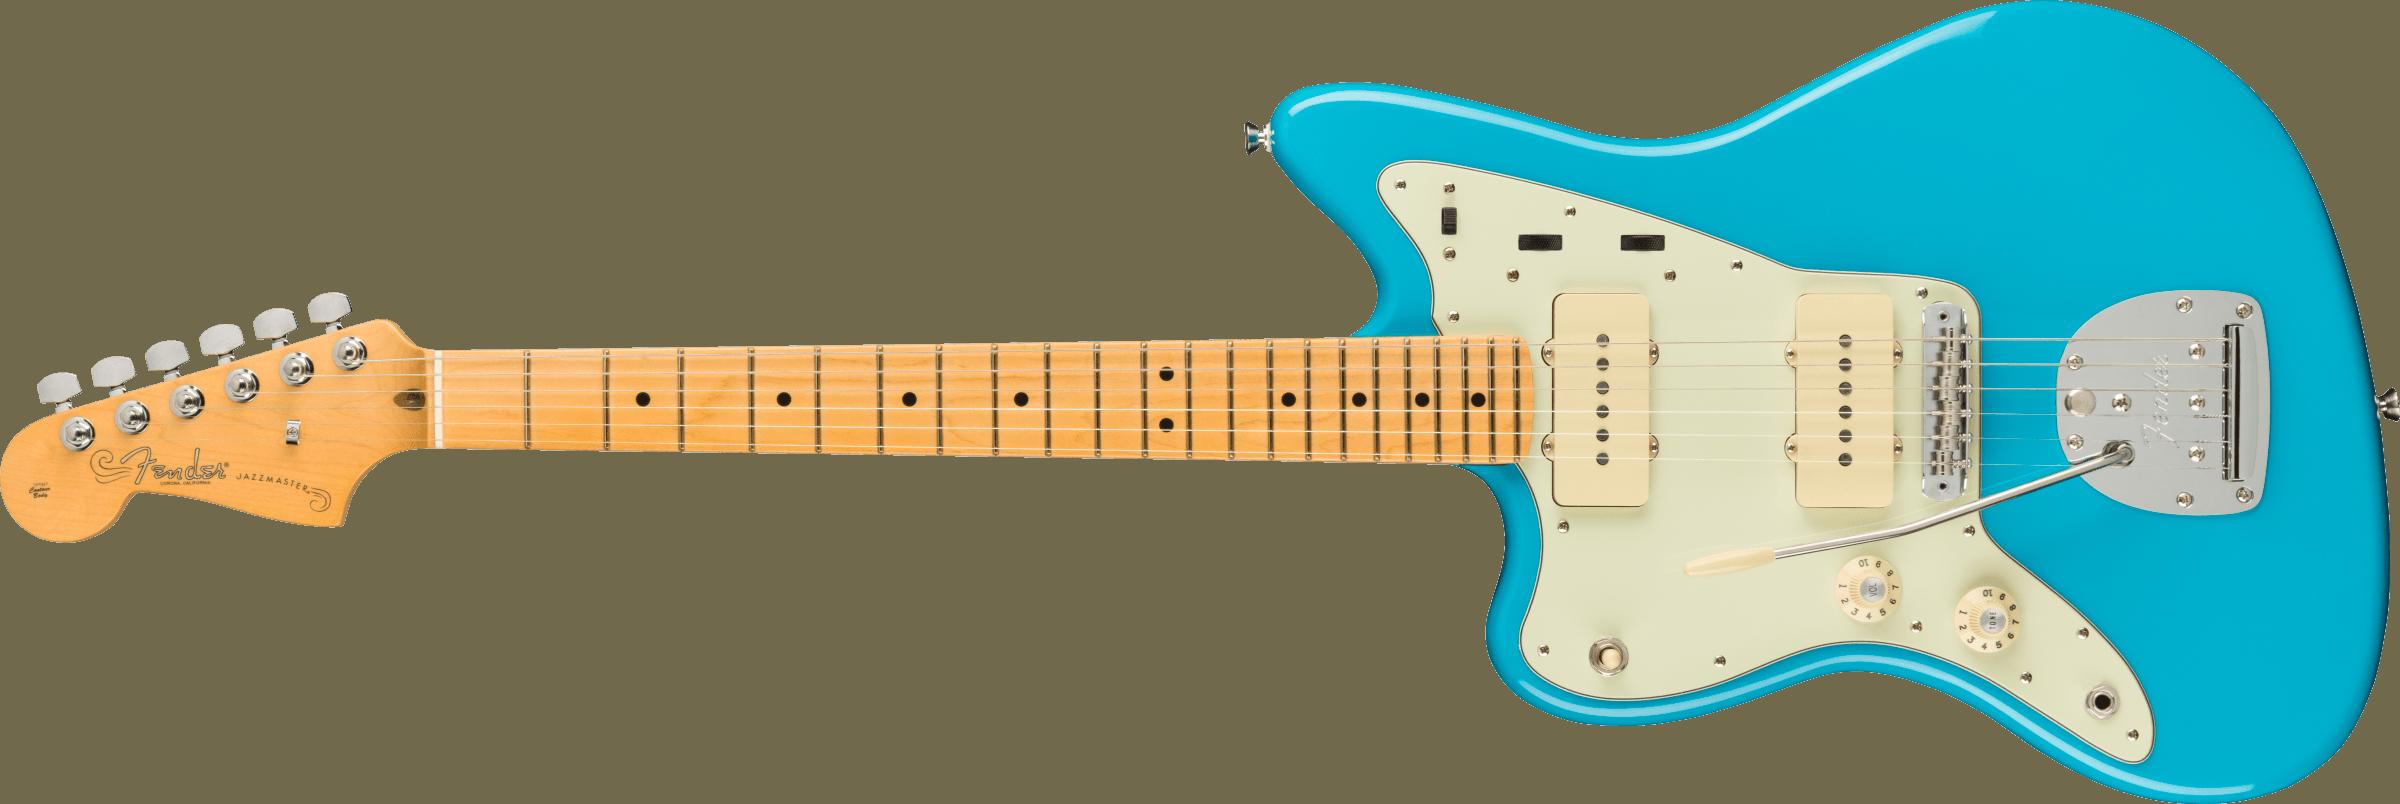 Fender American Professional II Jazzmaster® Left-Hand, Maple Fingerboard, Miami Blue